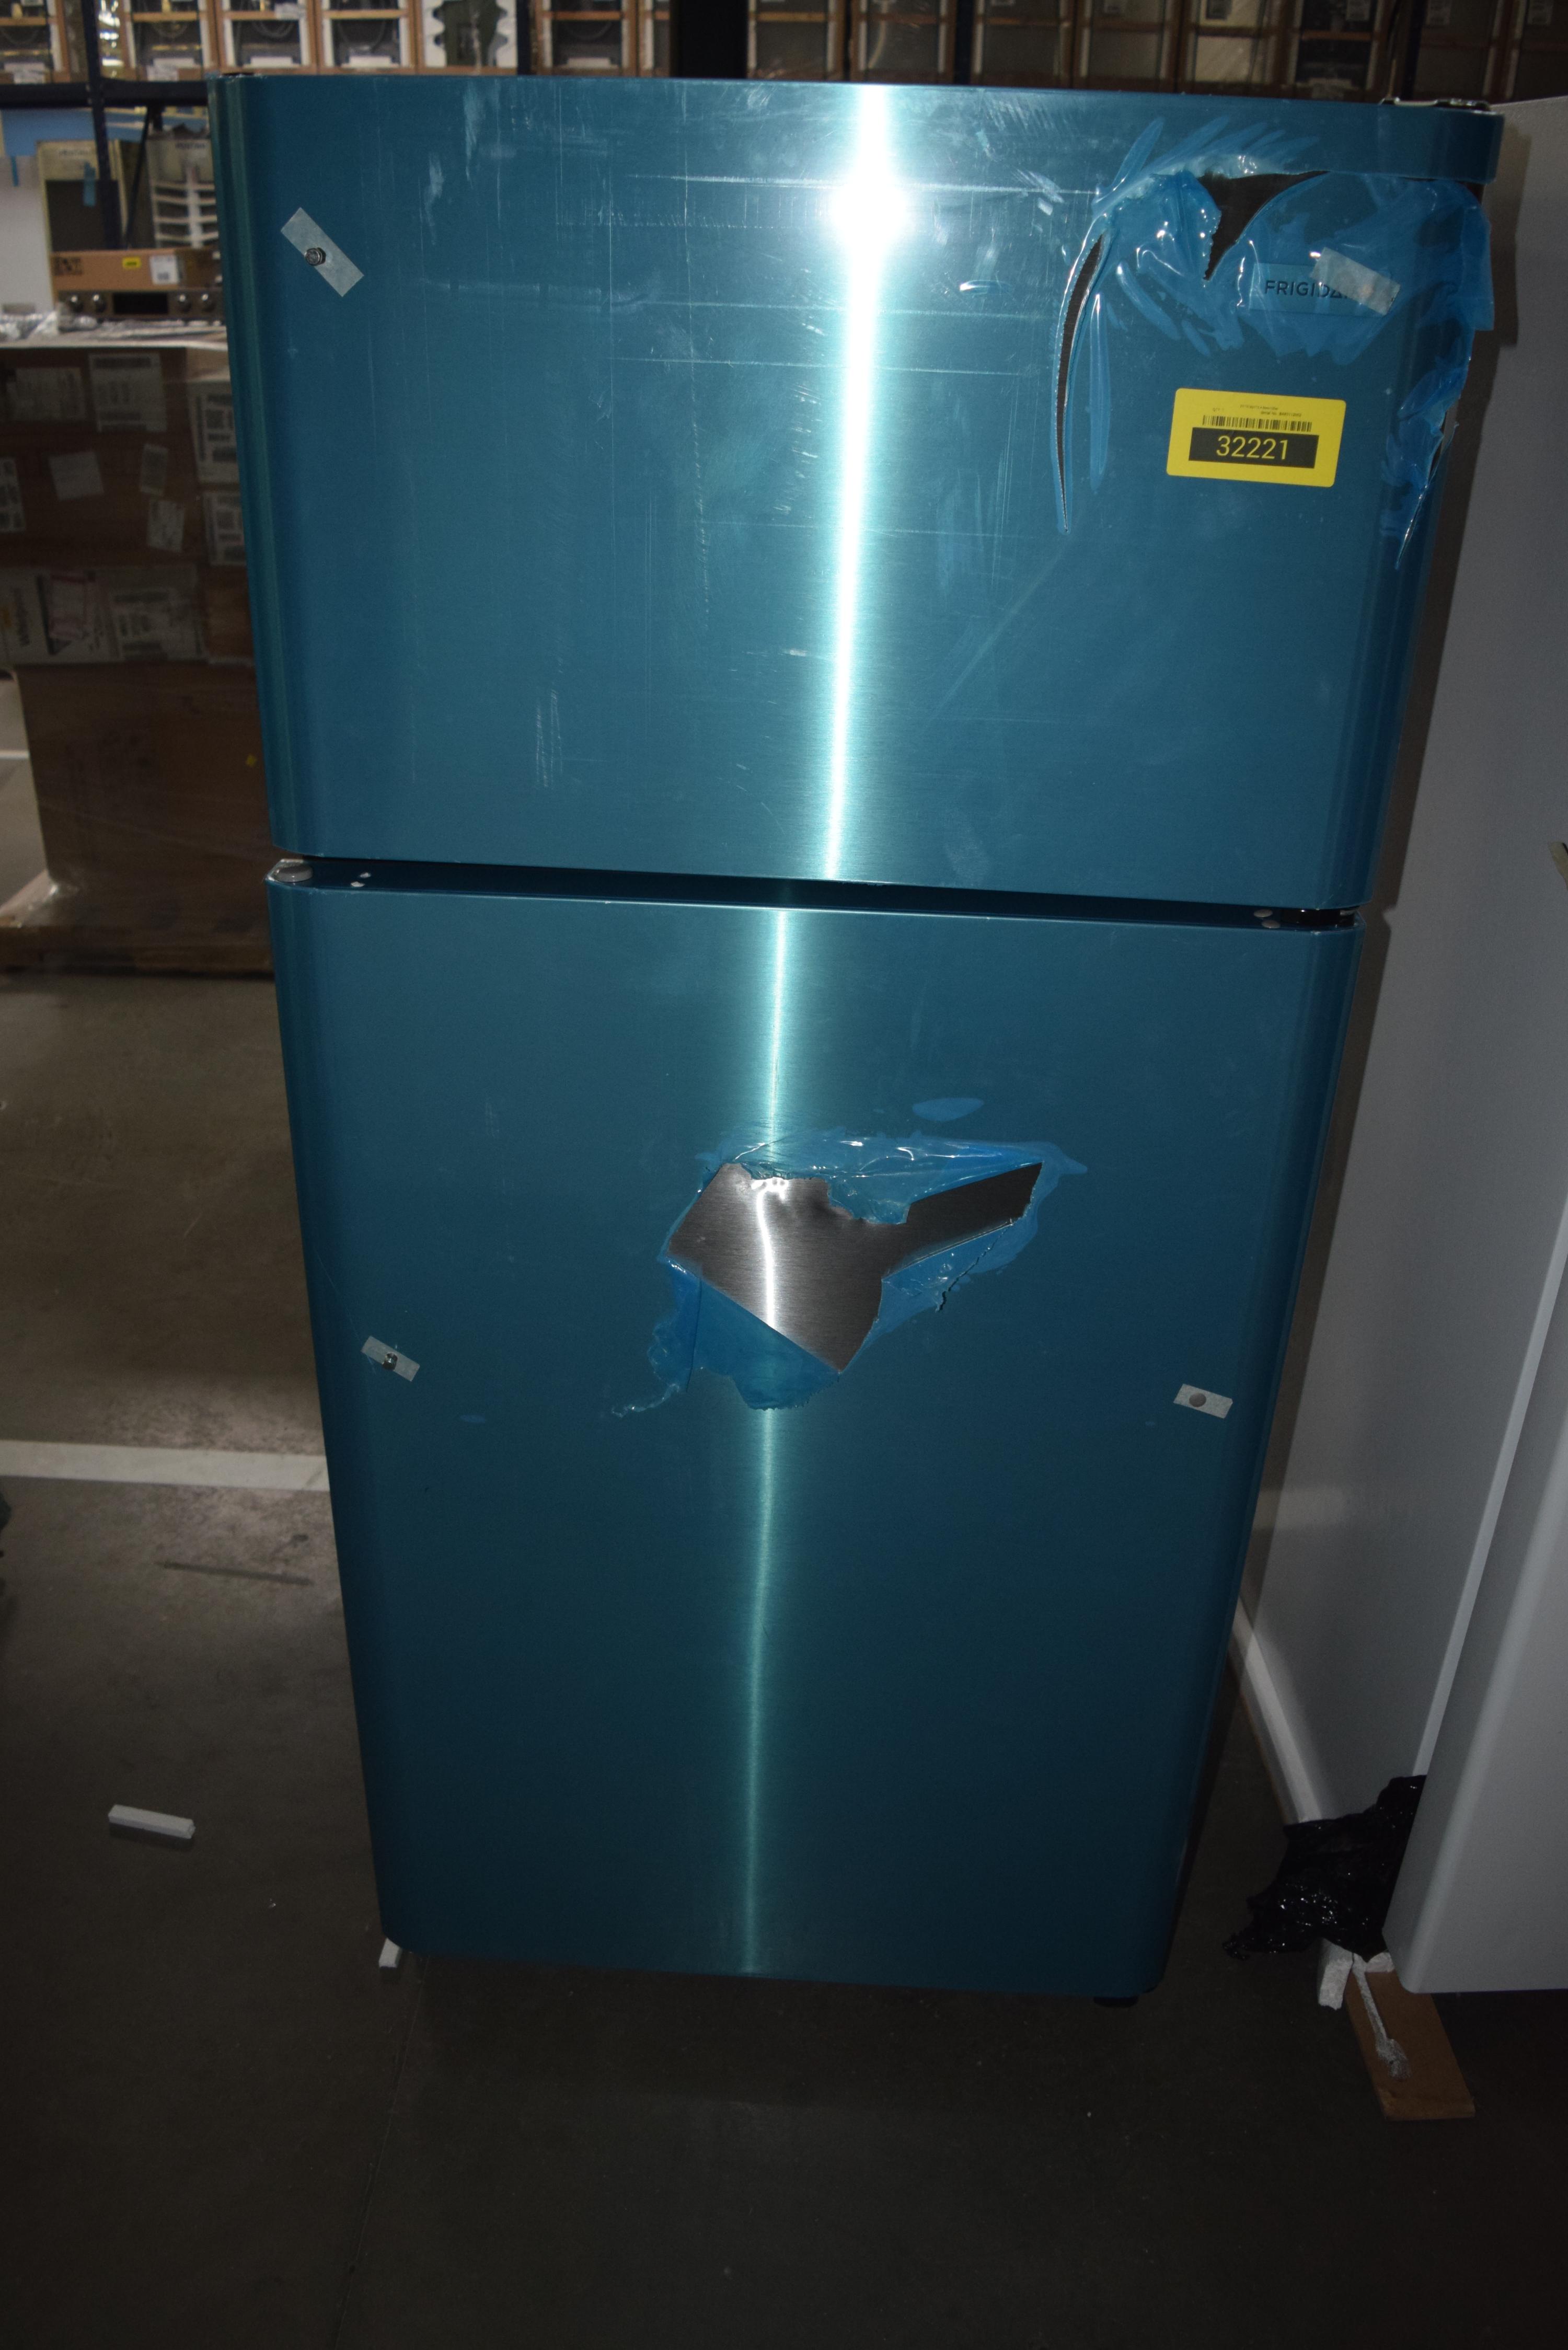 Frigidaire FFTR1821TS Top-Freezer Refrigerator Stainless Steel